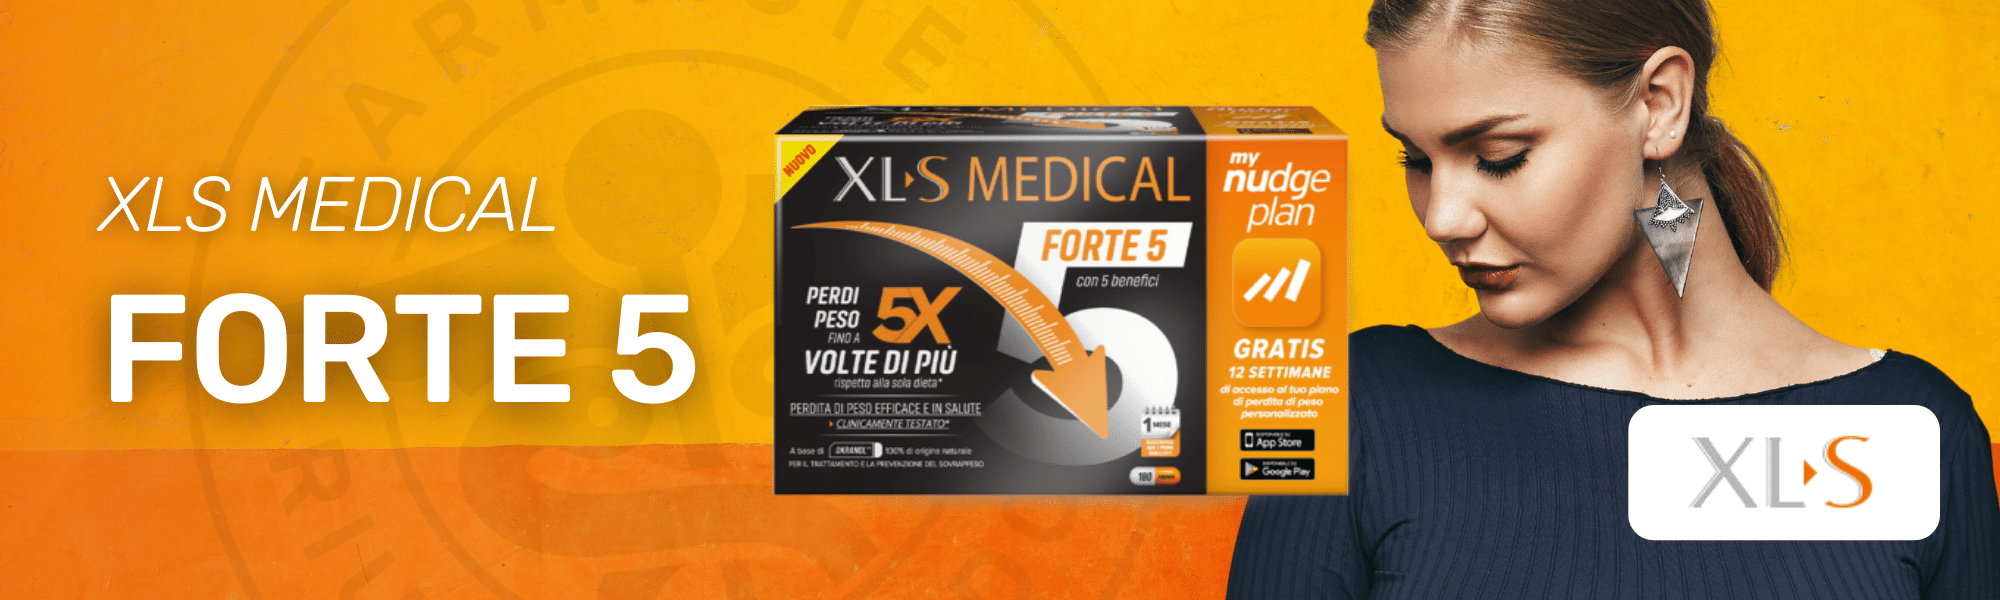 XLS Medical Forte 5 Offerta